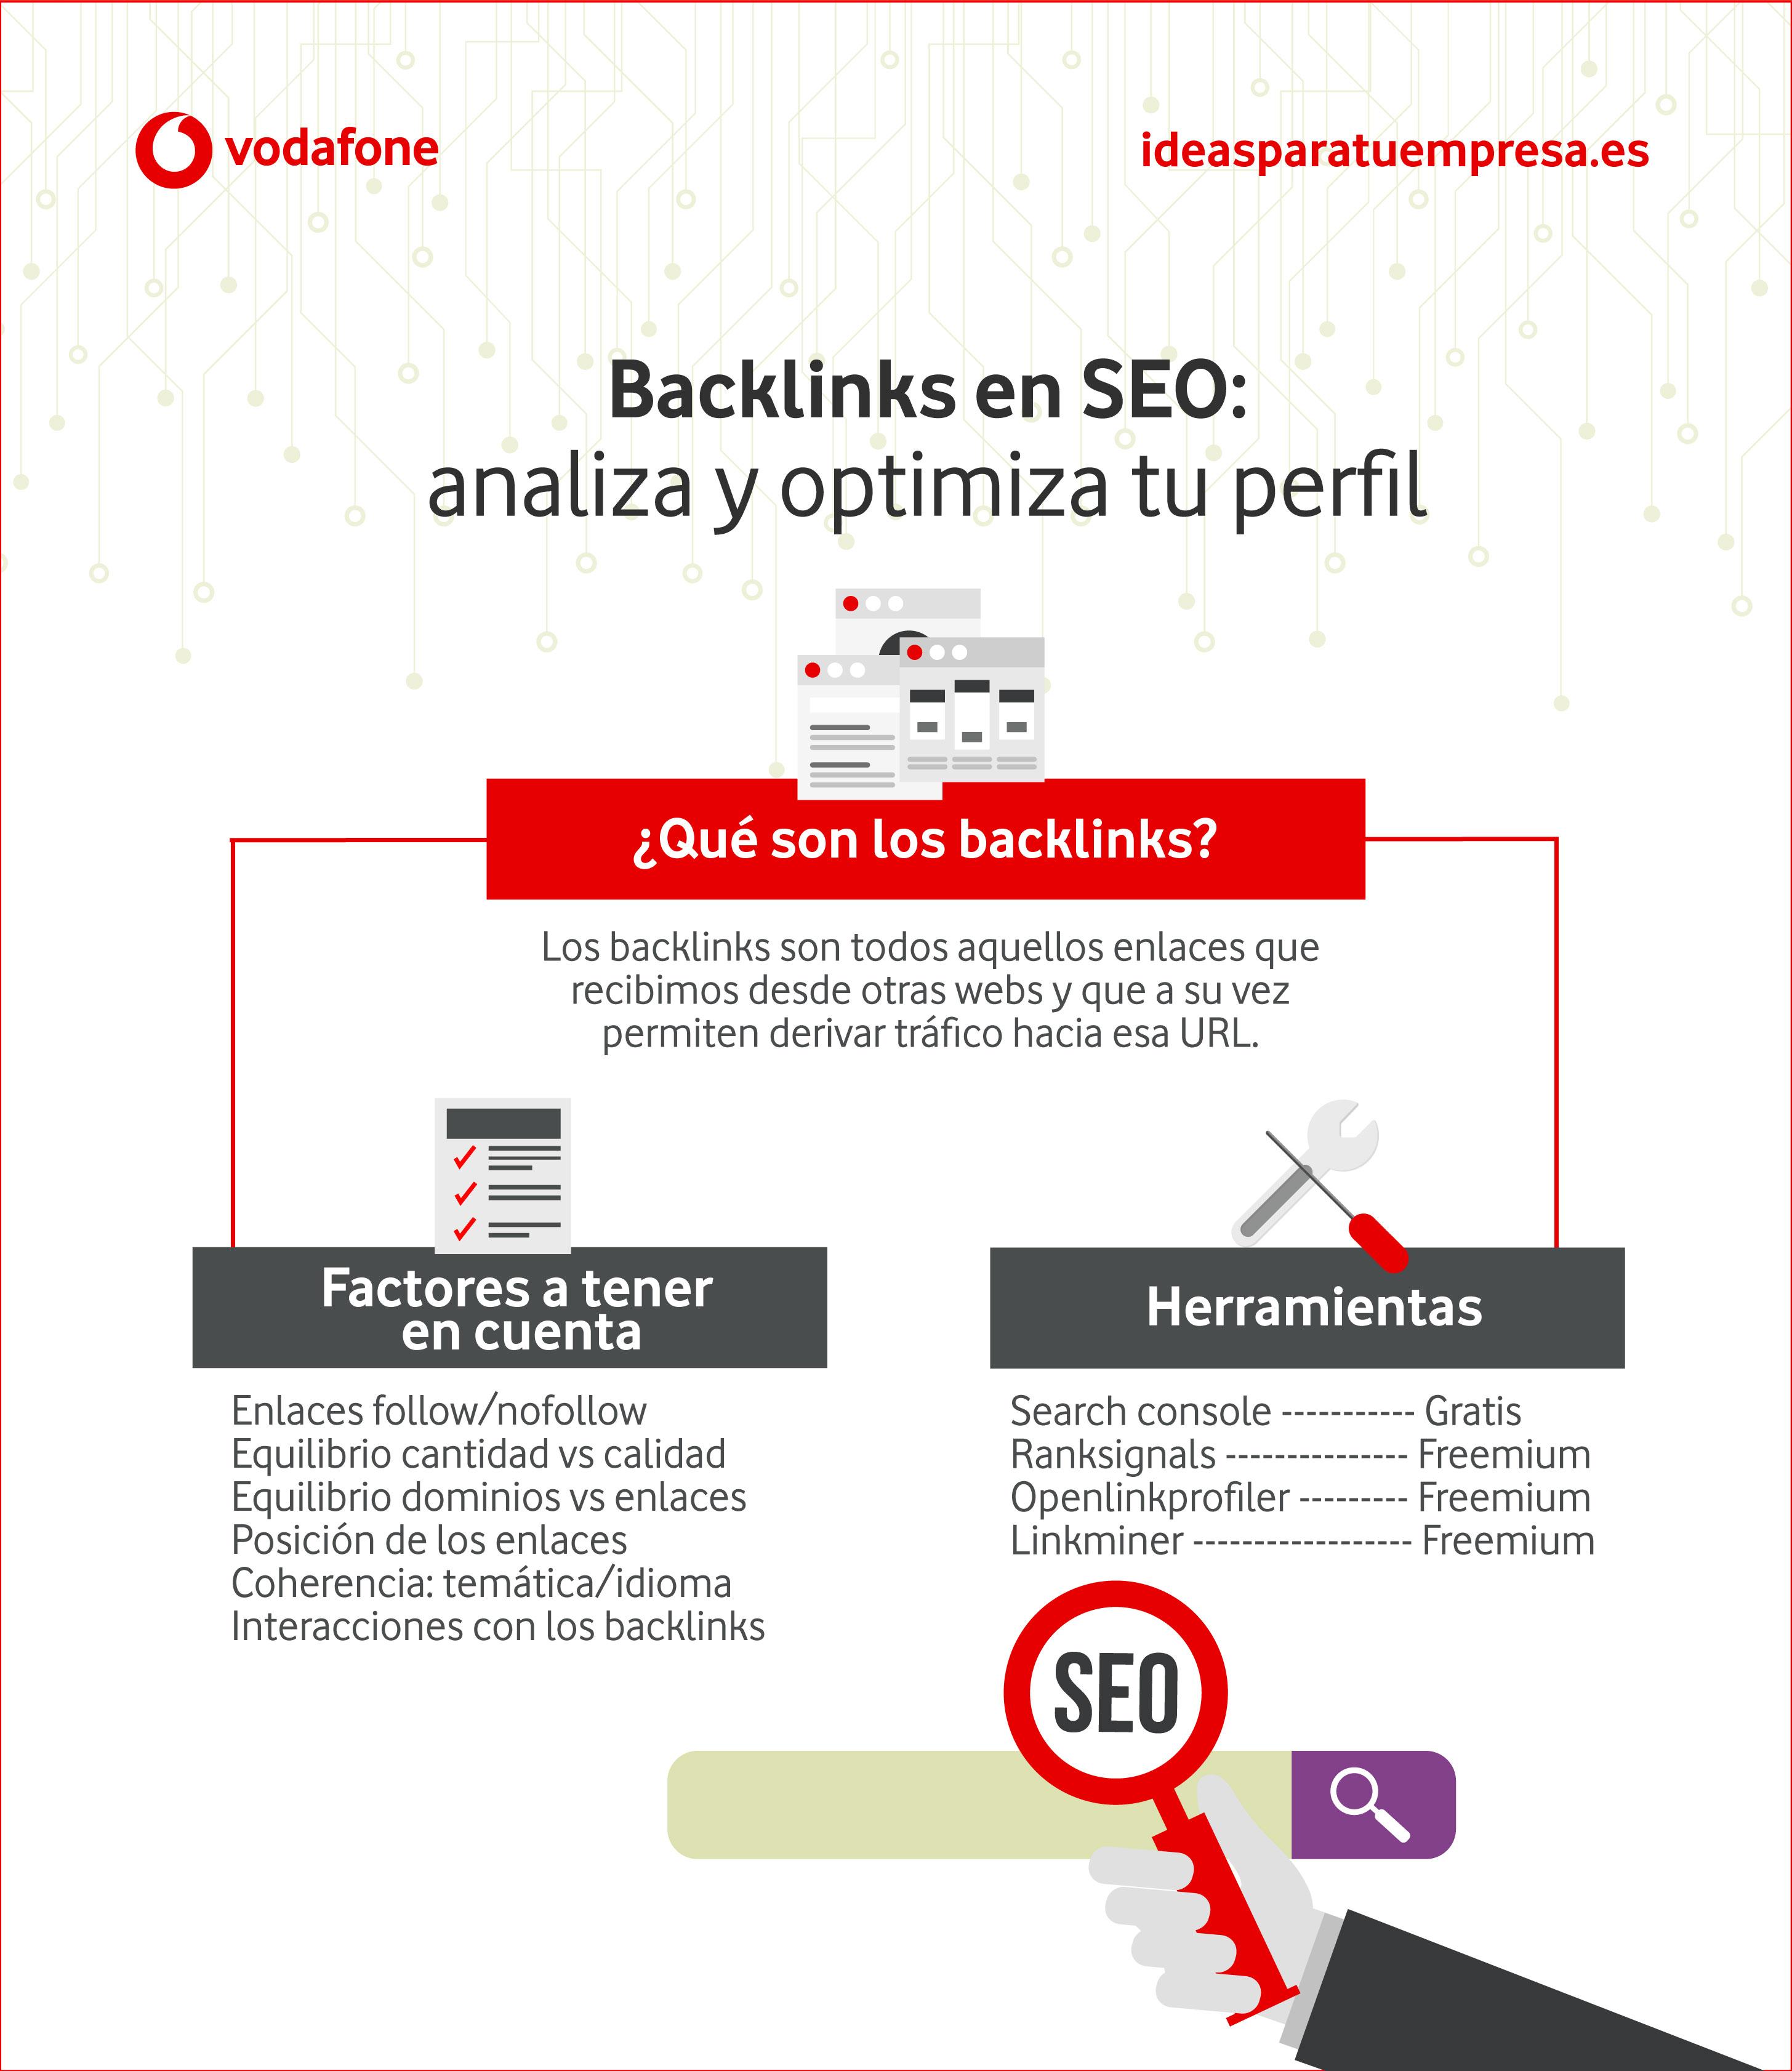 Backlinks en SEO: analiza y optimiza tu perfil